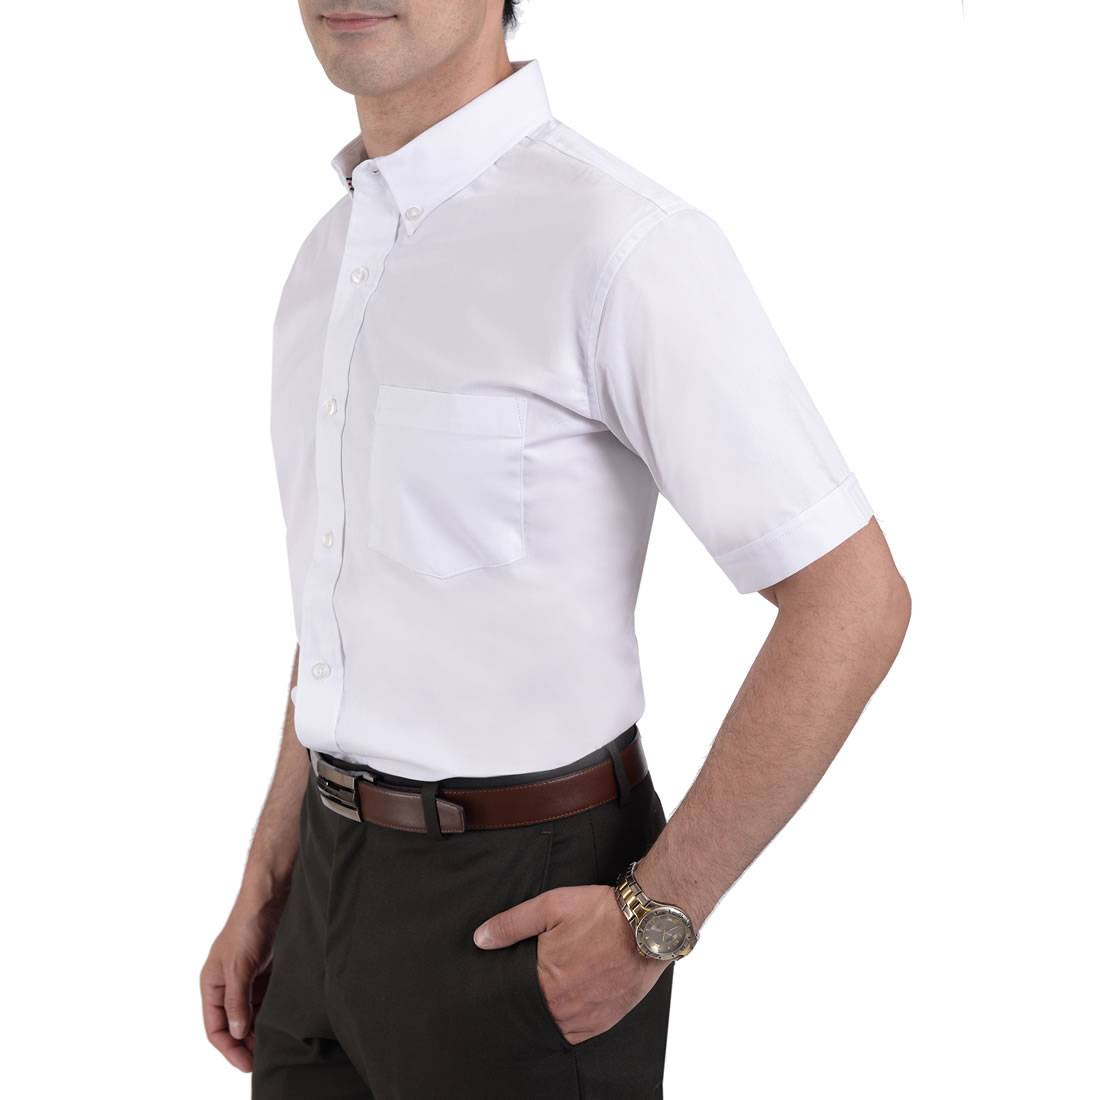 042331381702-03-Camisa-Manga-Corta-classic-Fit-Blanco-yale